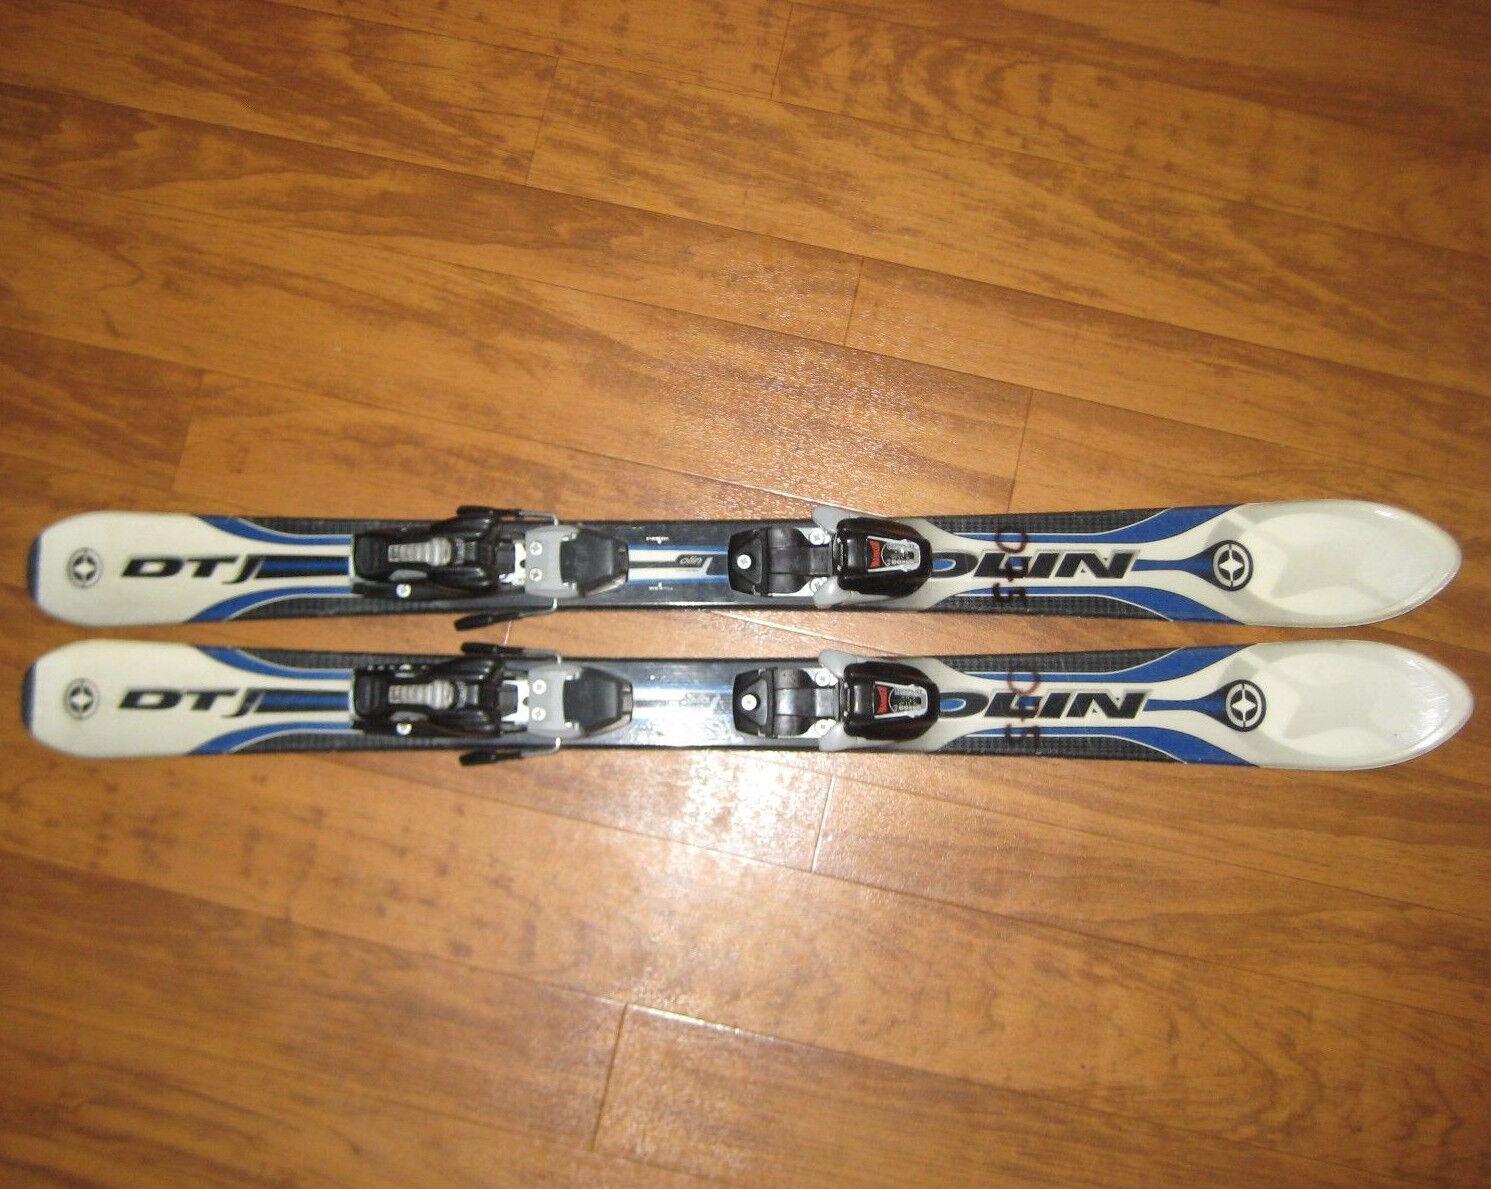 OLIN DTJ Youth Kids Juniors Skis 112 CM Marker M 450 Bindings SKI JR